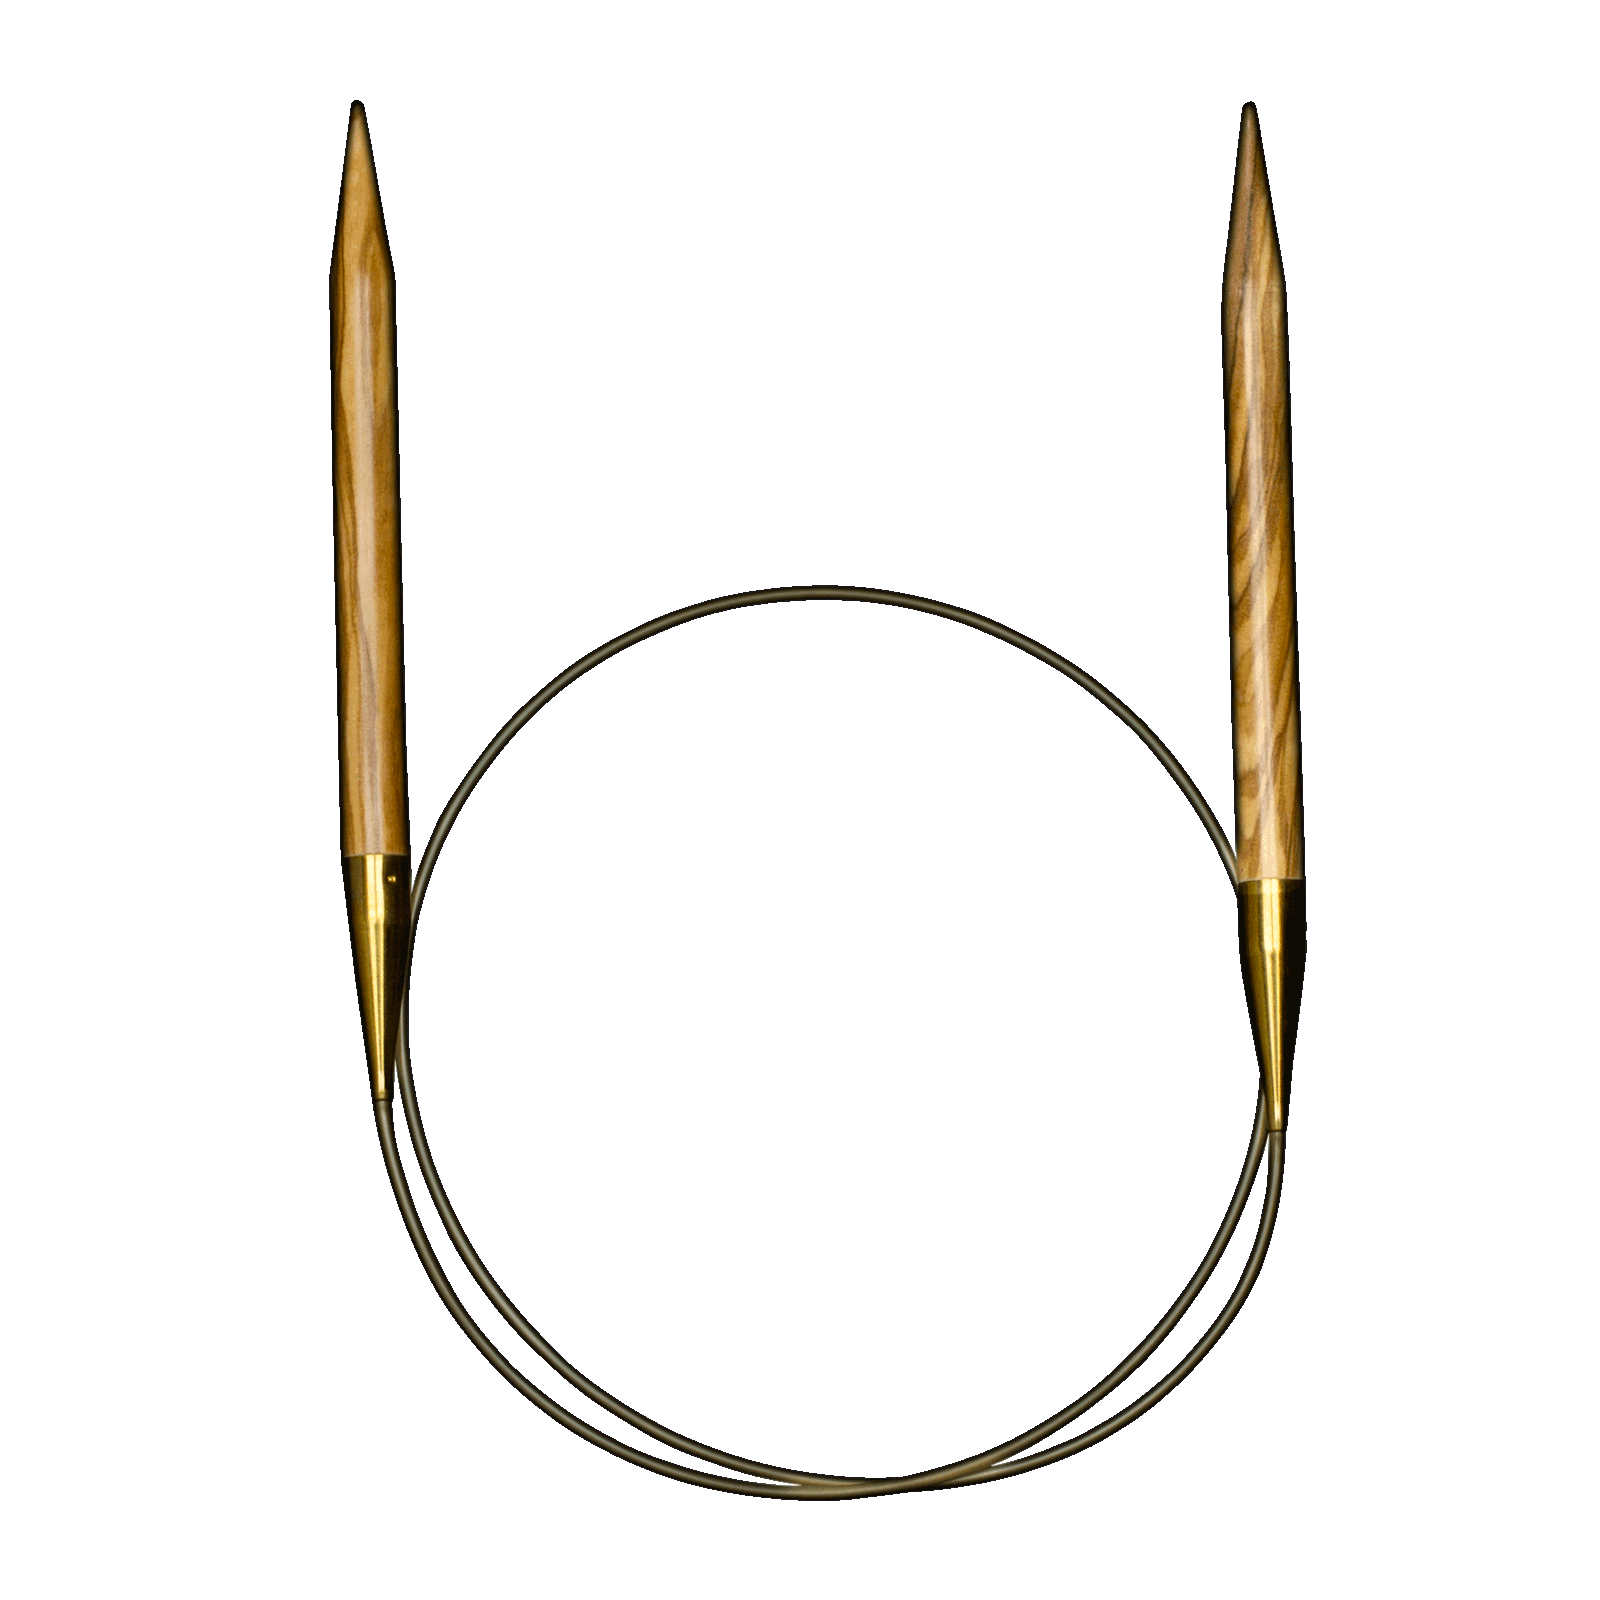 Addi Nature Olive 40 Circular Needles